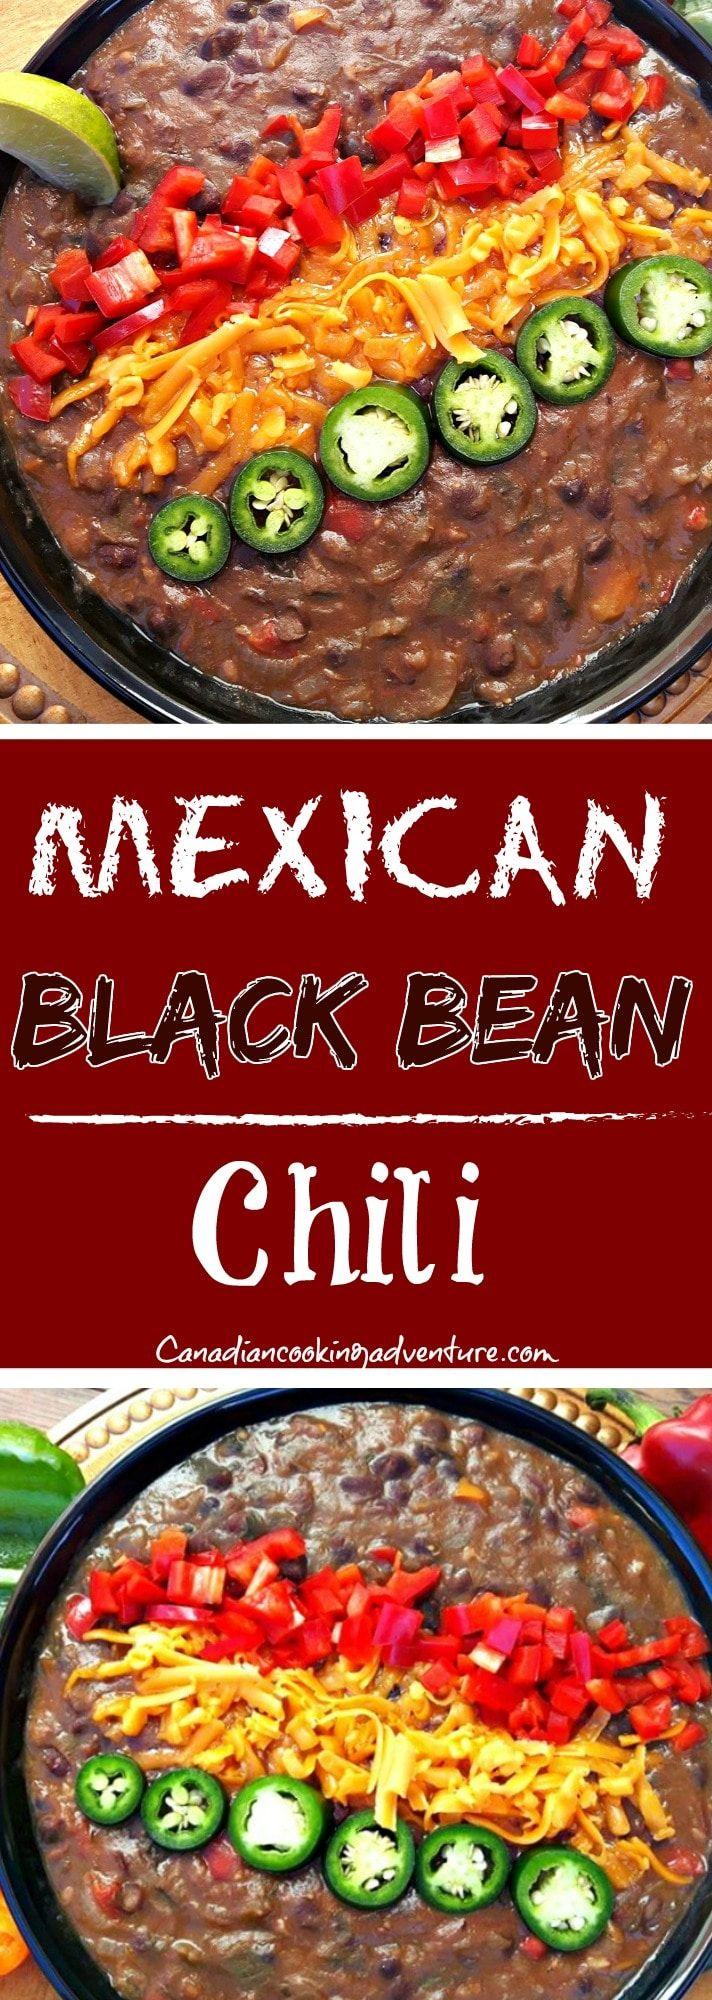 Mexican Black Bean Chili #Mexican #BlackBean #Chili